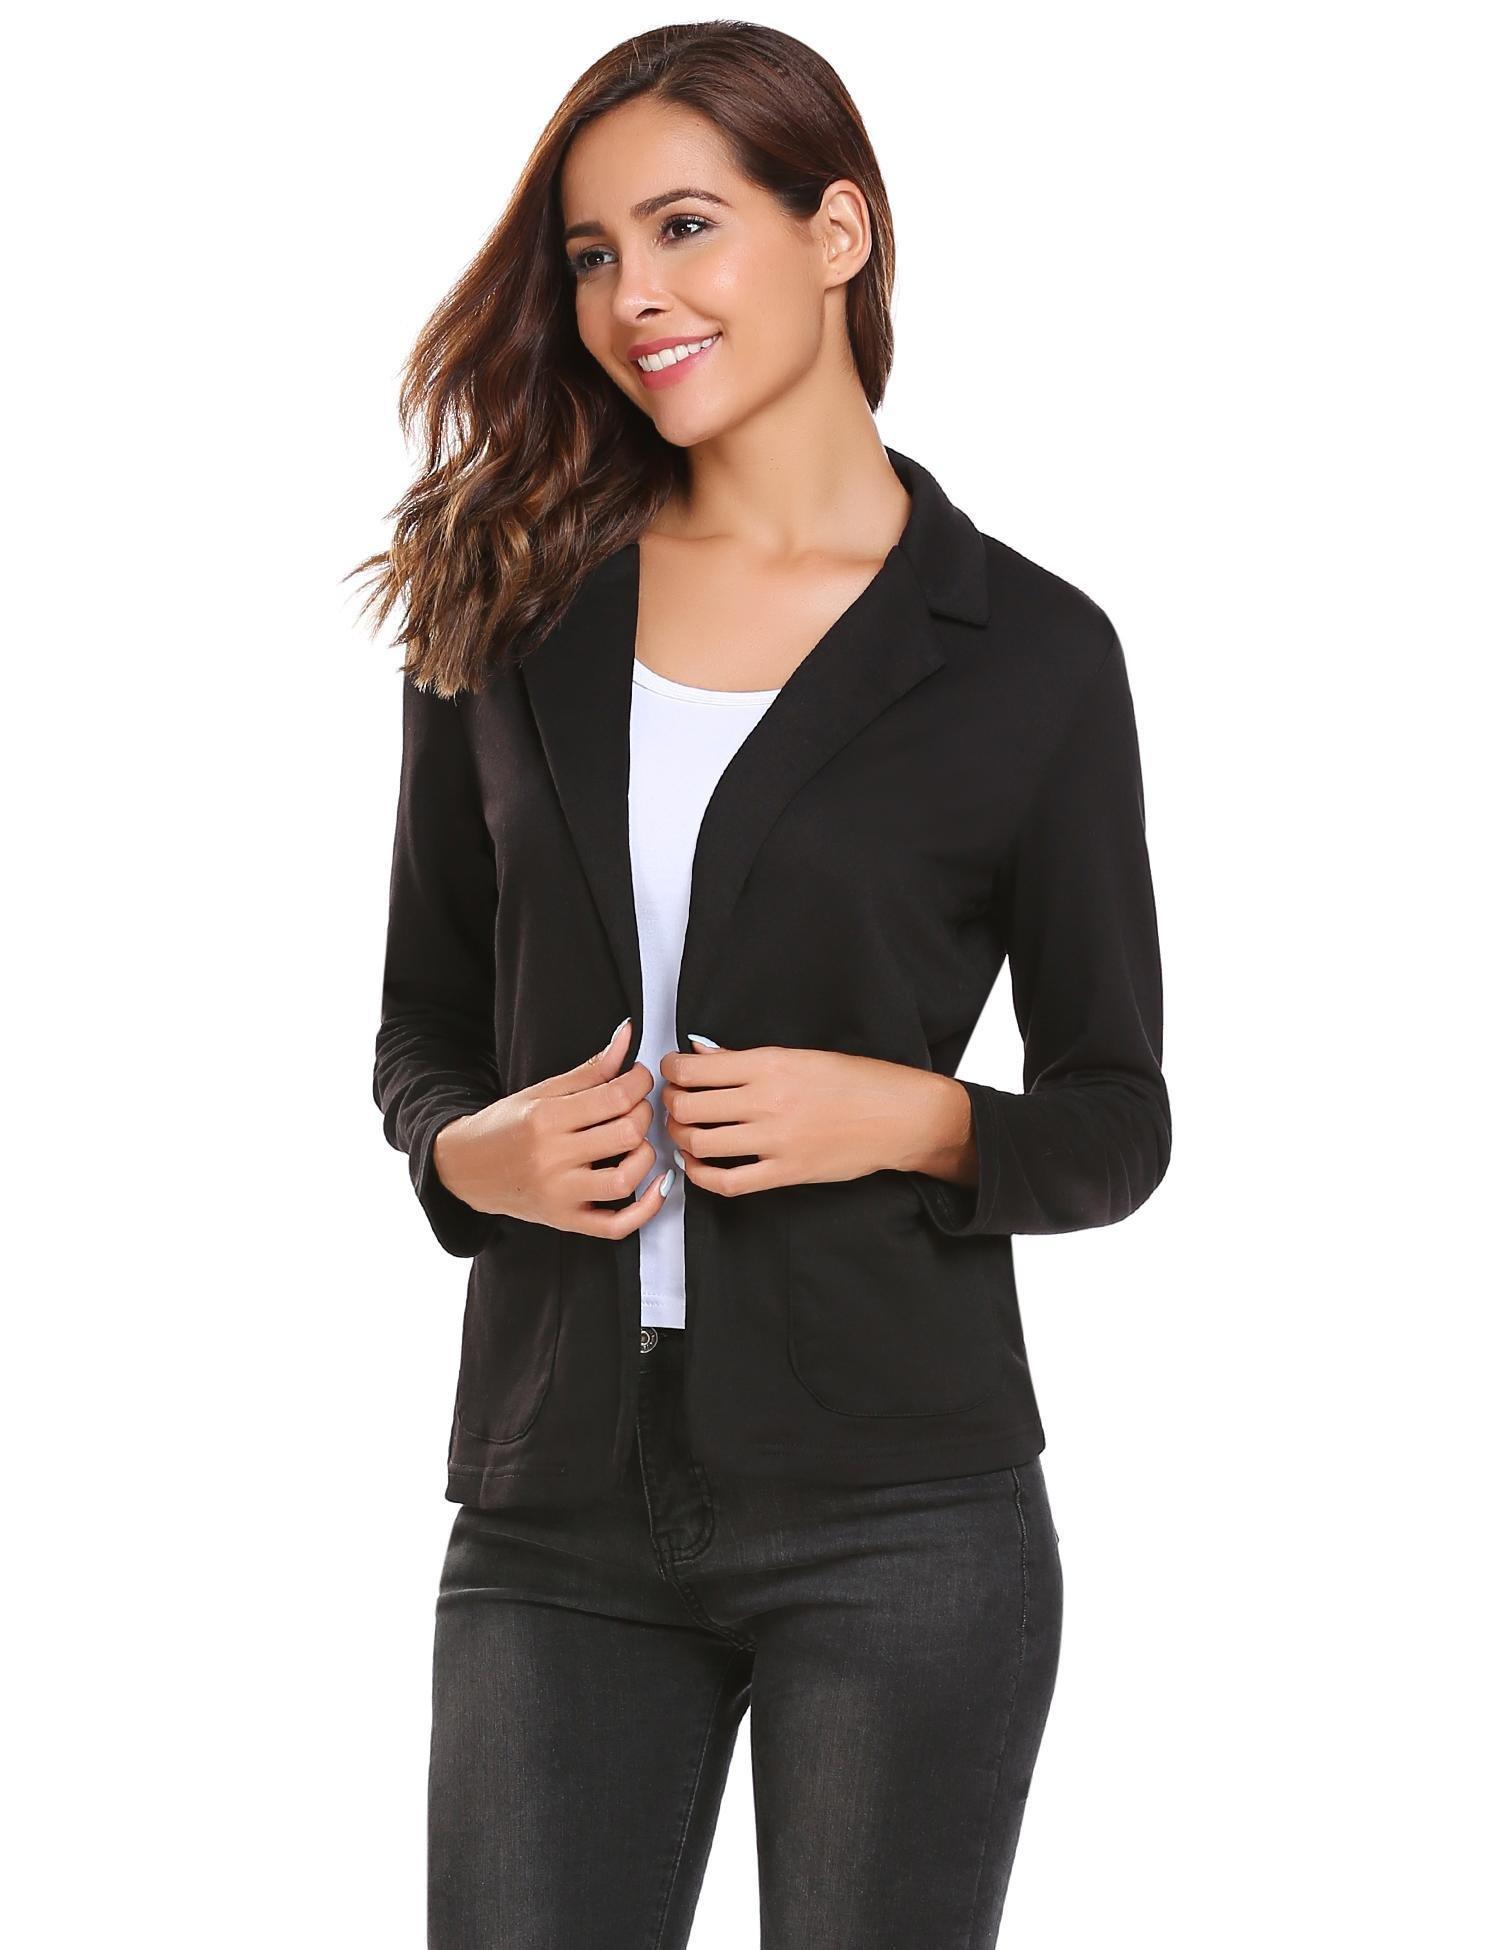 Zeagoo Casual Work Office Slim Blazer Open Front Jacket For Women and Juniors Black XL